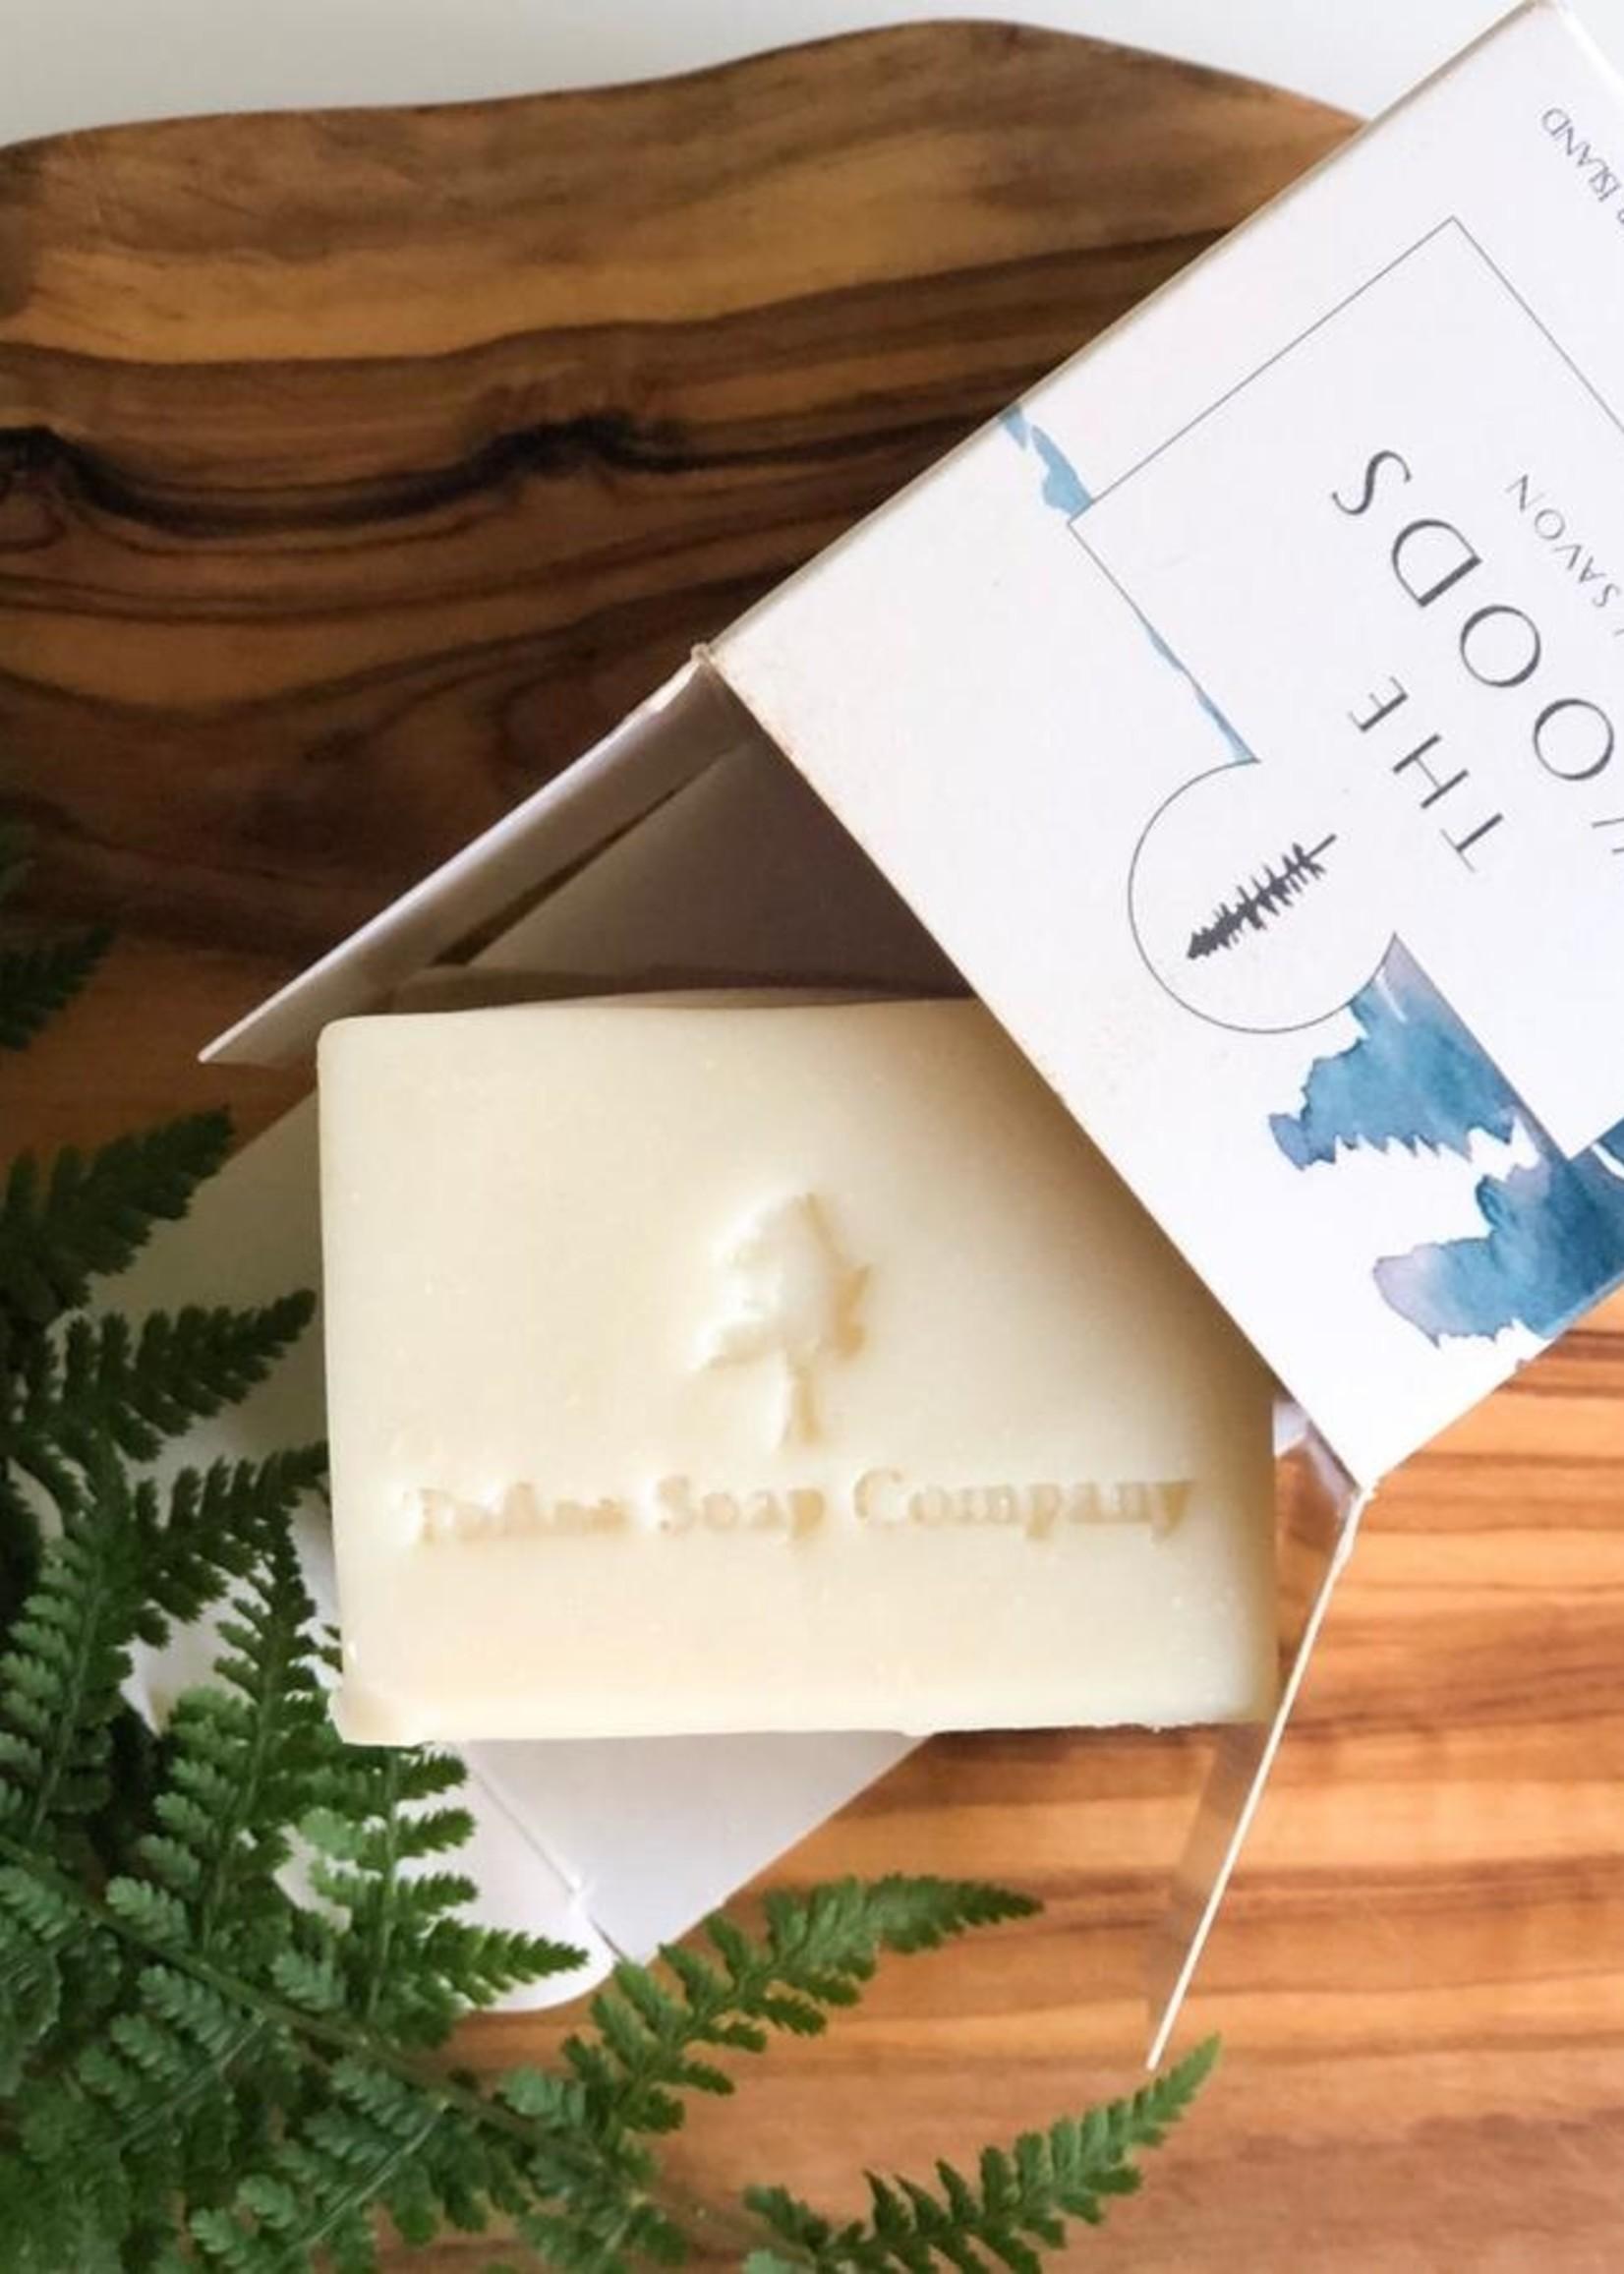 Tofino Soap Company Tofino Soap Company - The Woods Soap